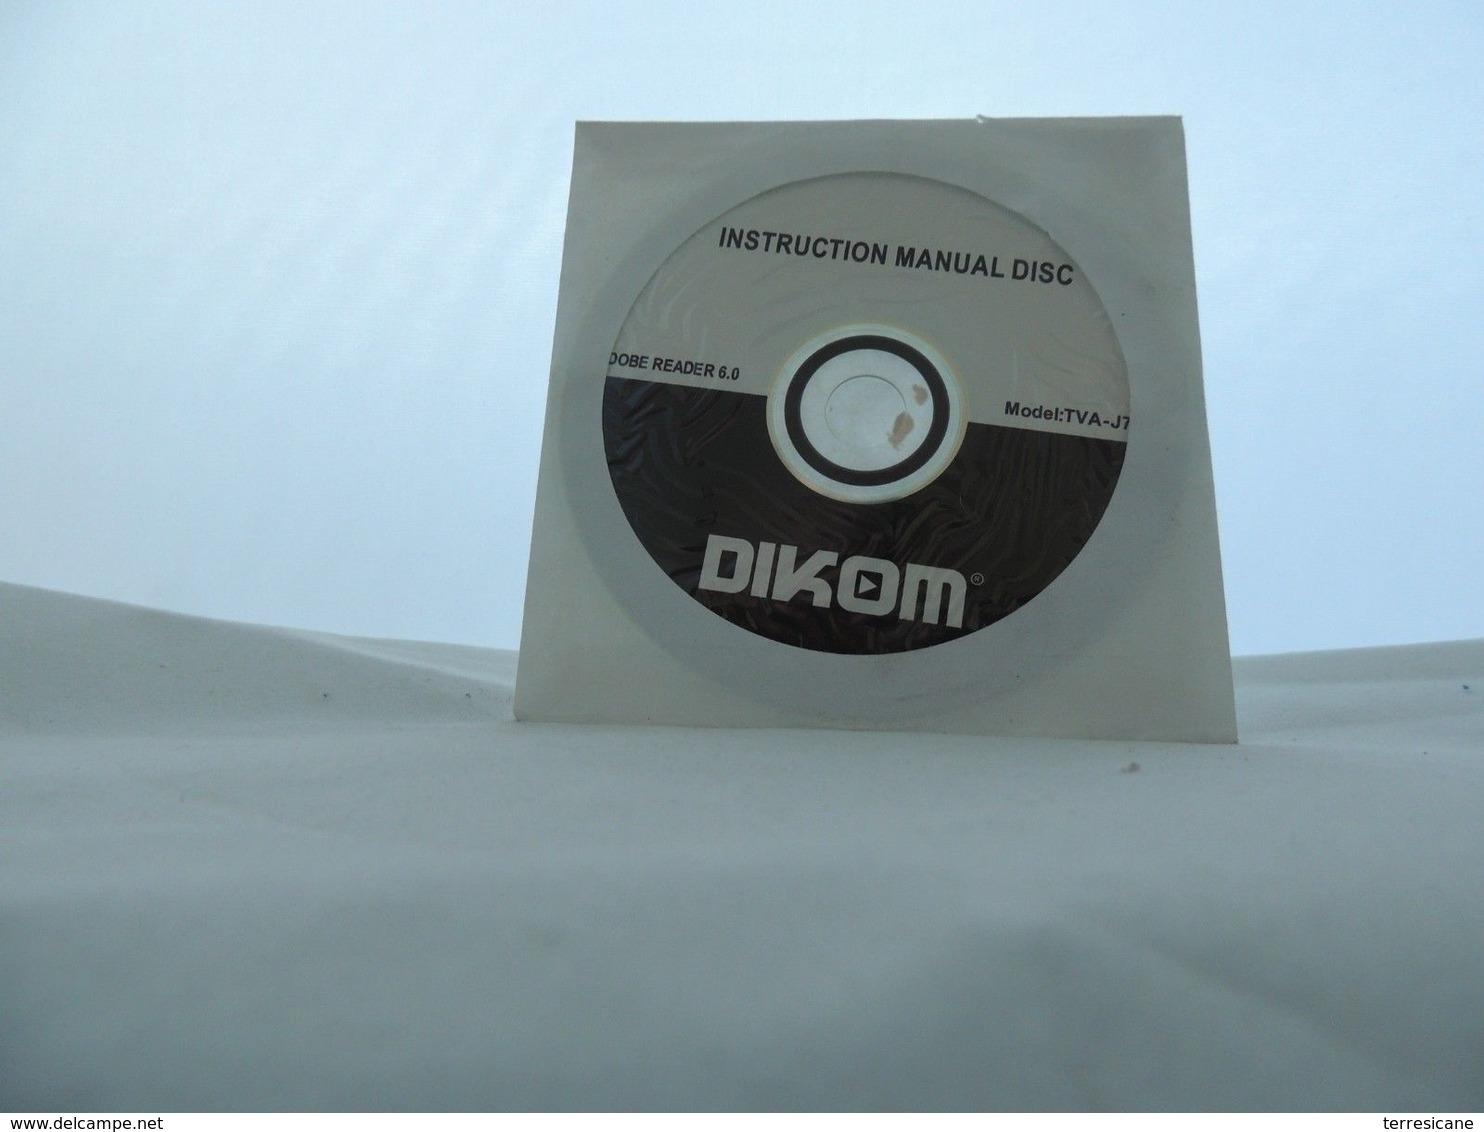 G4 DIKOM INSTRUCTION MANUAL DISC ADOBE READER 6.0 MODEL TVA J70B - Altre Collezioni